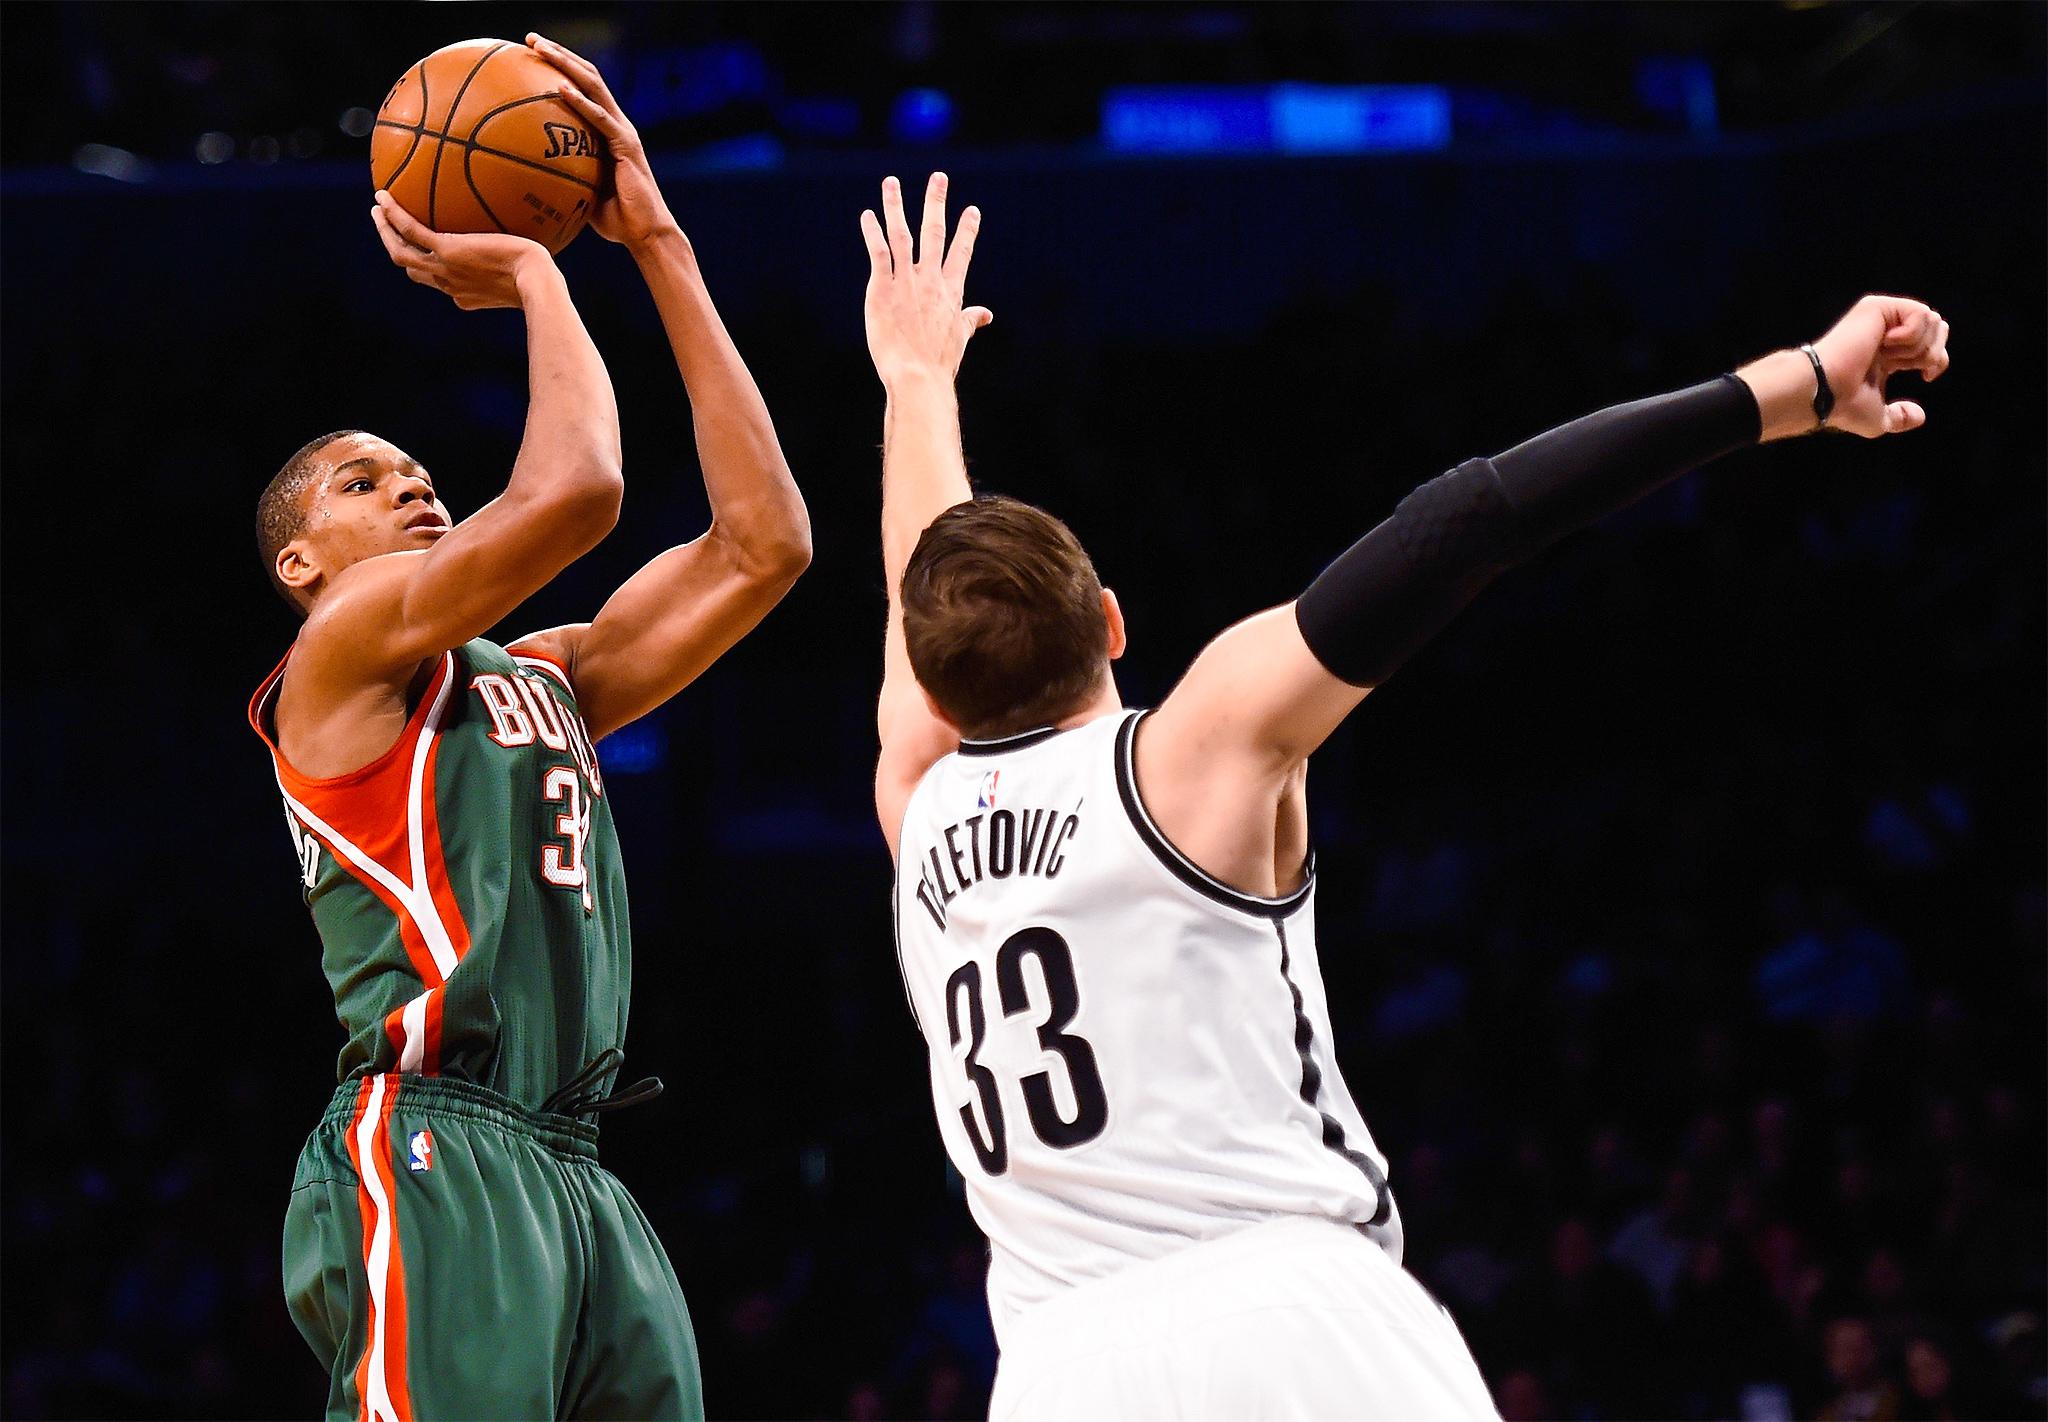 9. Giannis Antetokounmpo - NBA Top 25 Under 25 - ESPN